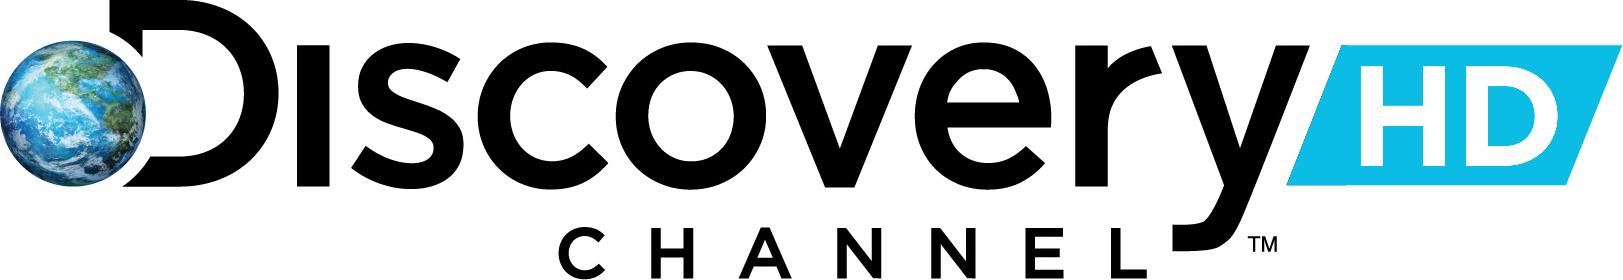 image discovery channel hdpng logofanonpedia fandom